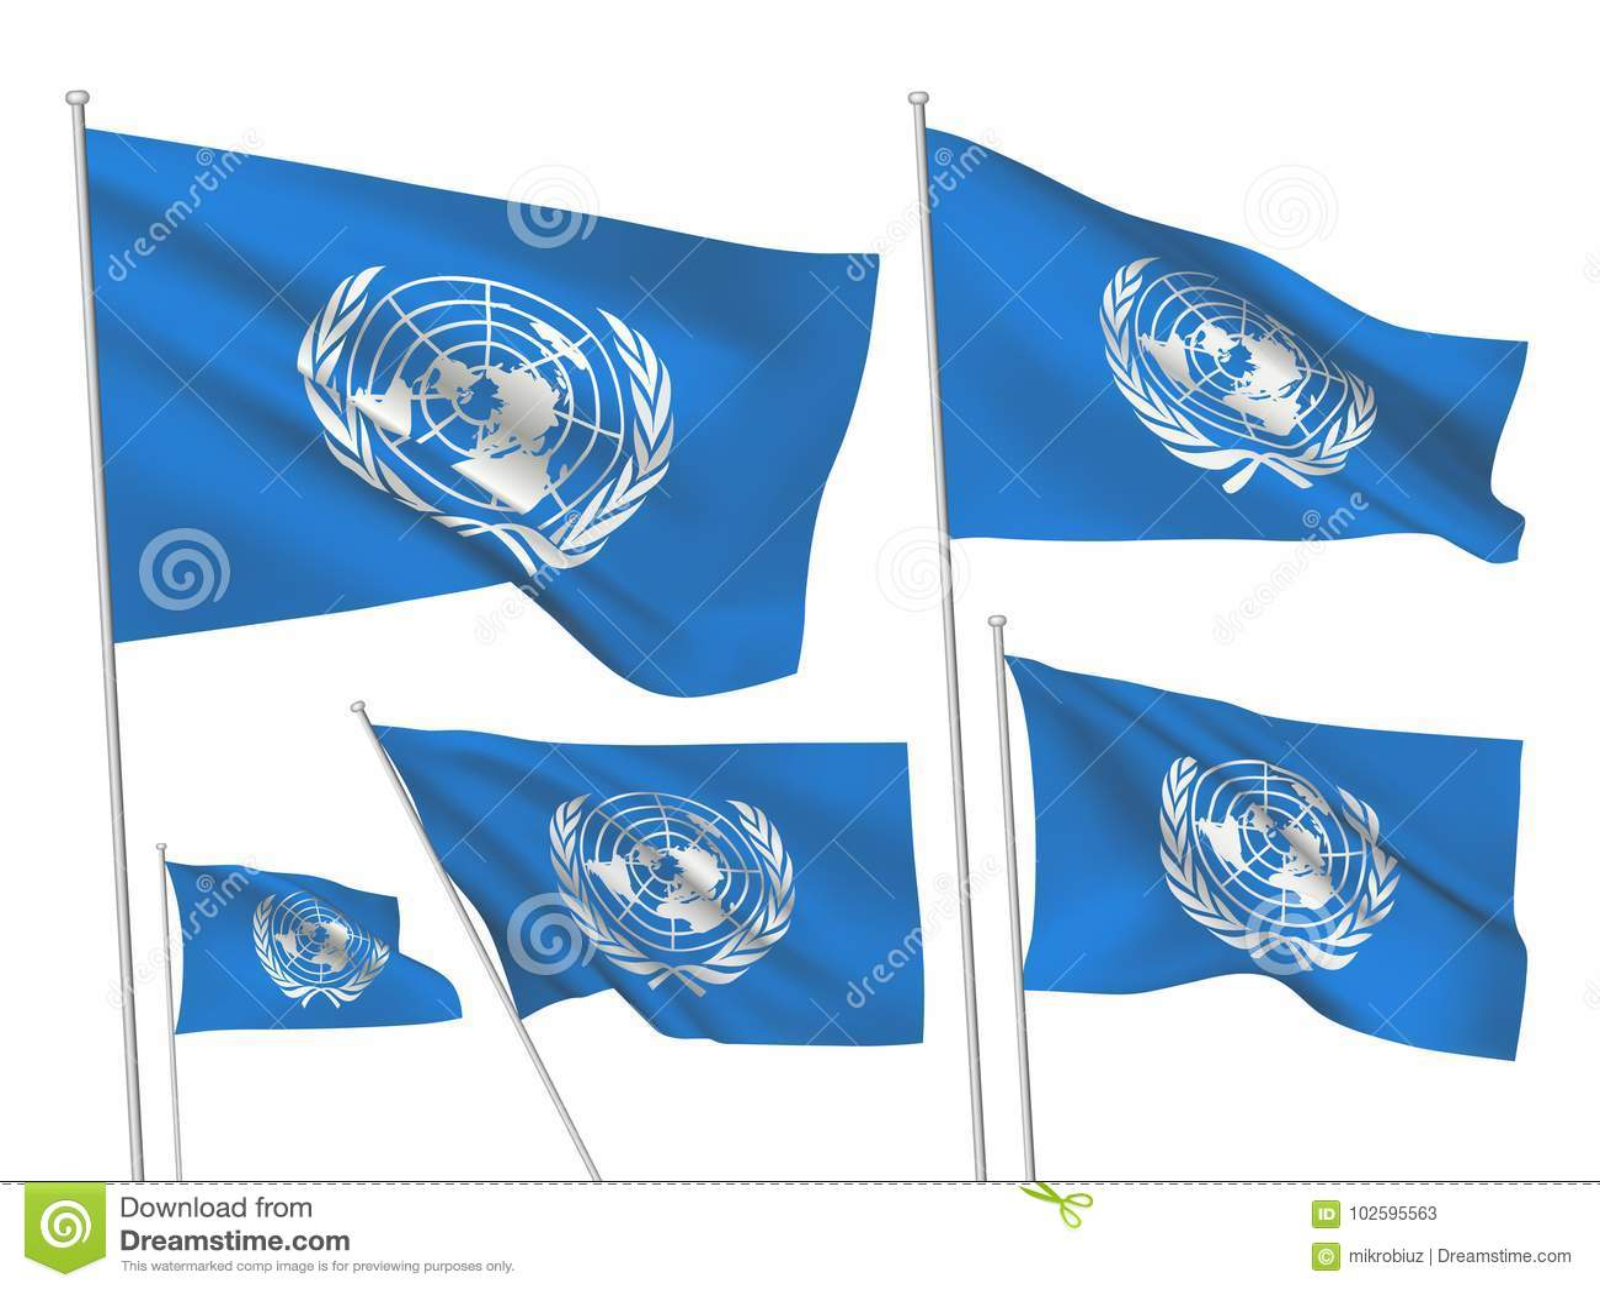 Флаги вектора организации Организации Объединенных Наций